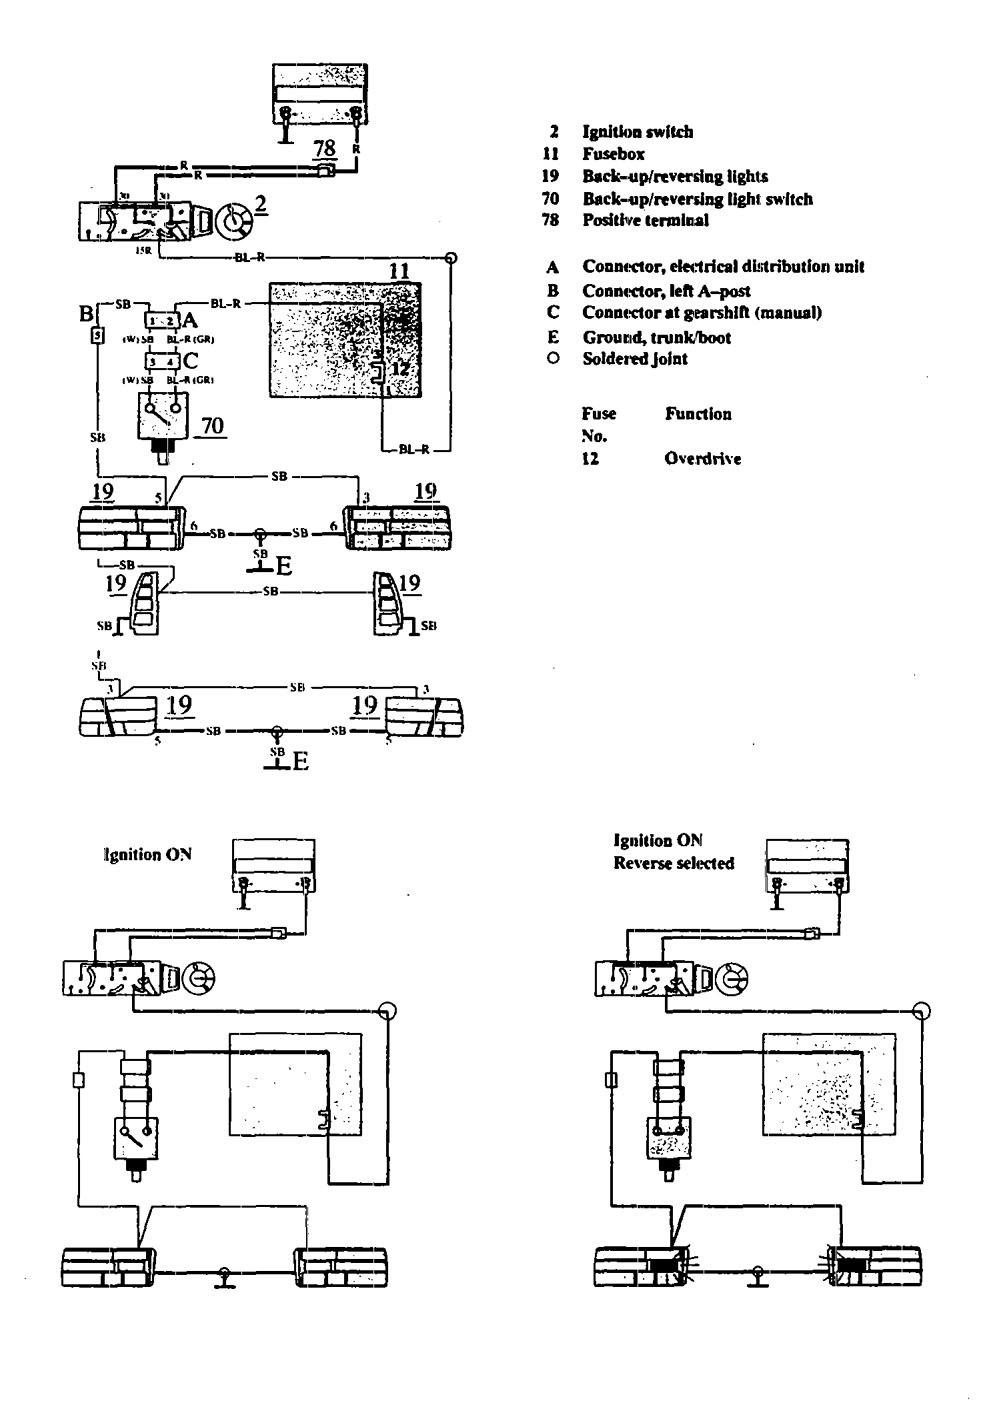 Wiring Diagram For 1991 Volvo 740 : Volvo  wiring diagrams reverse lamp